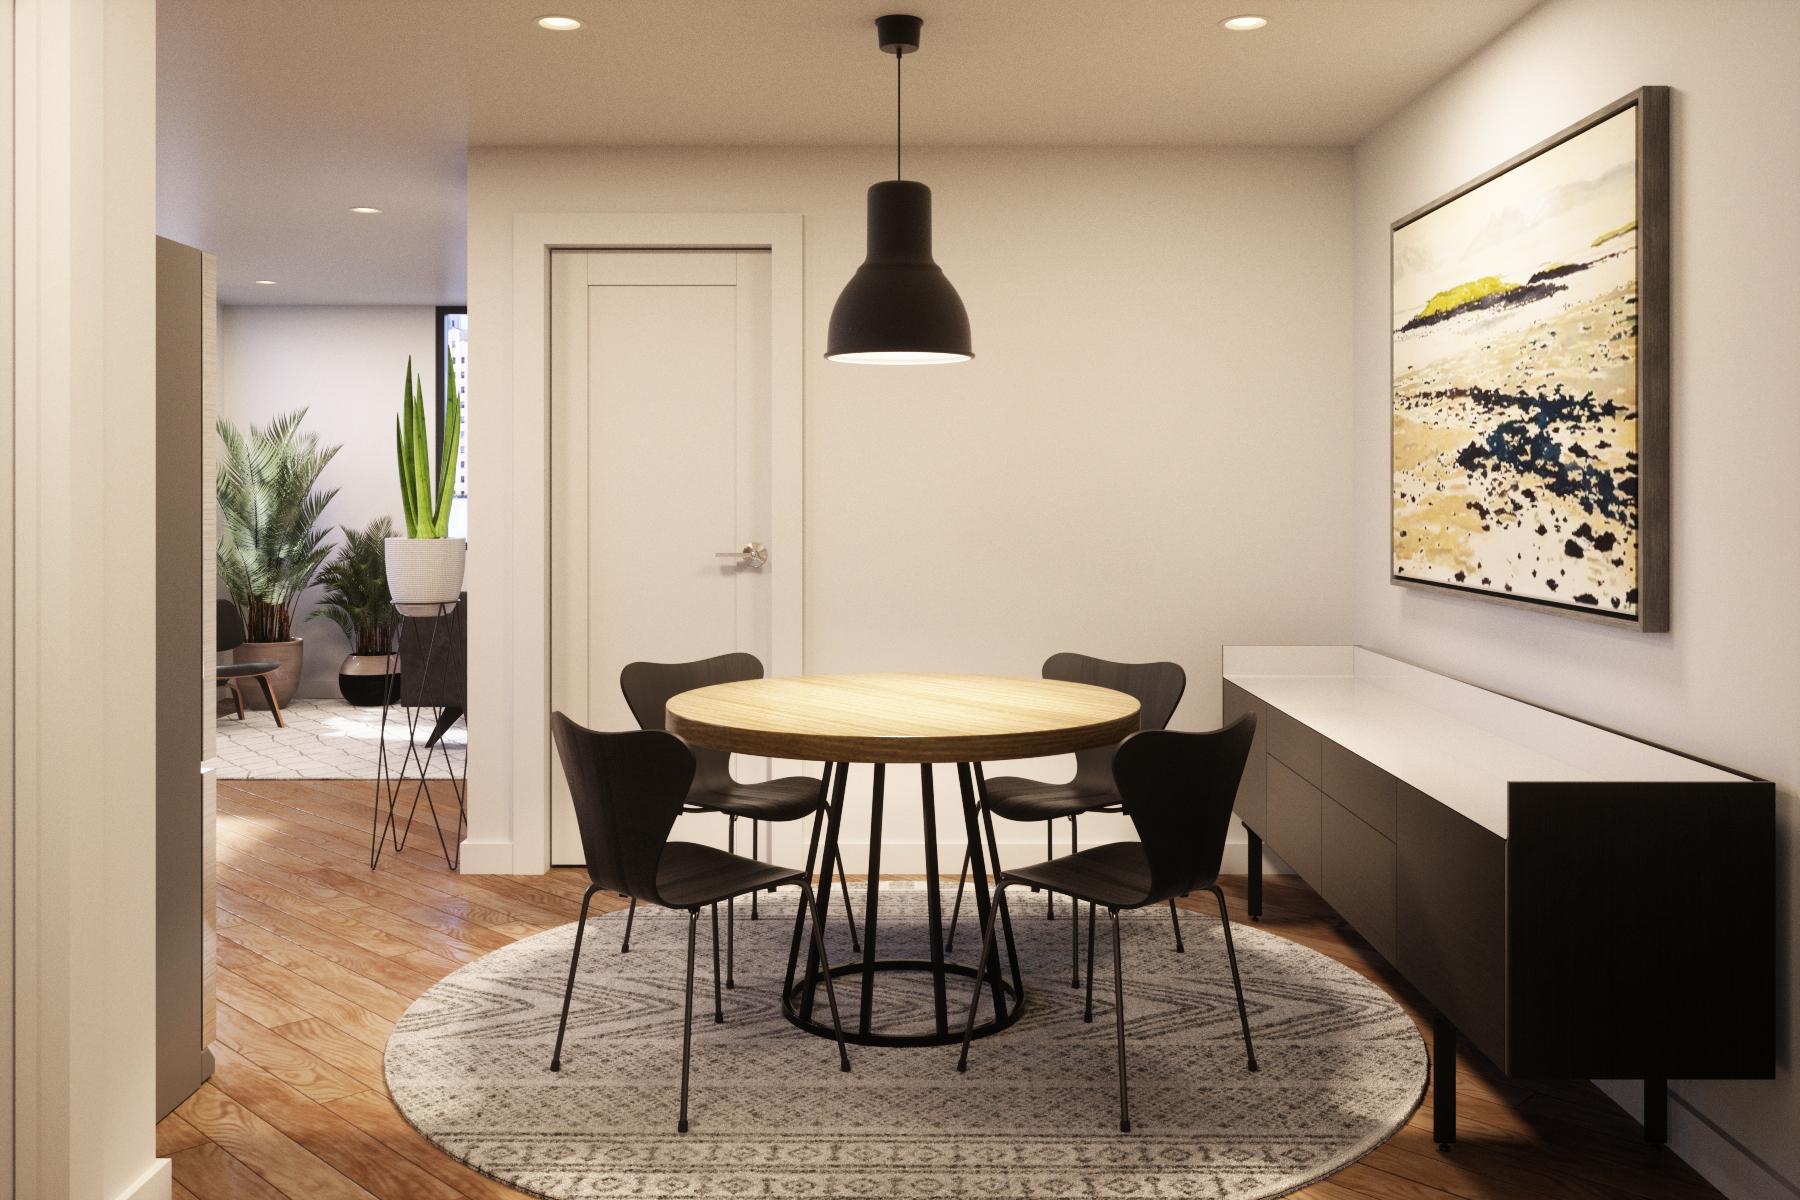 Interior design rendering of a dining room